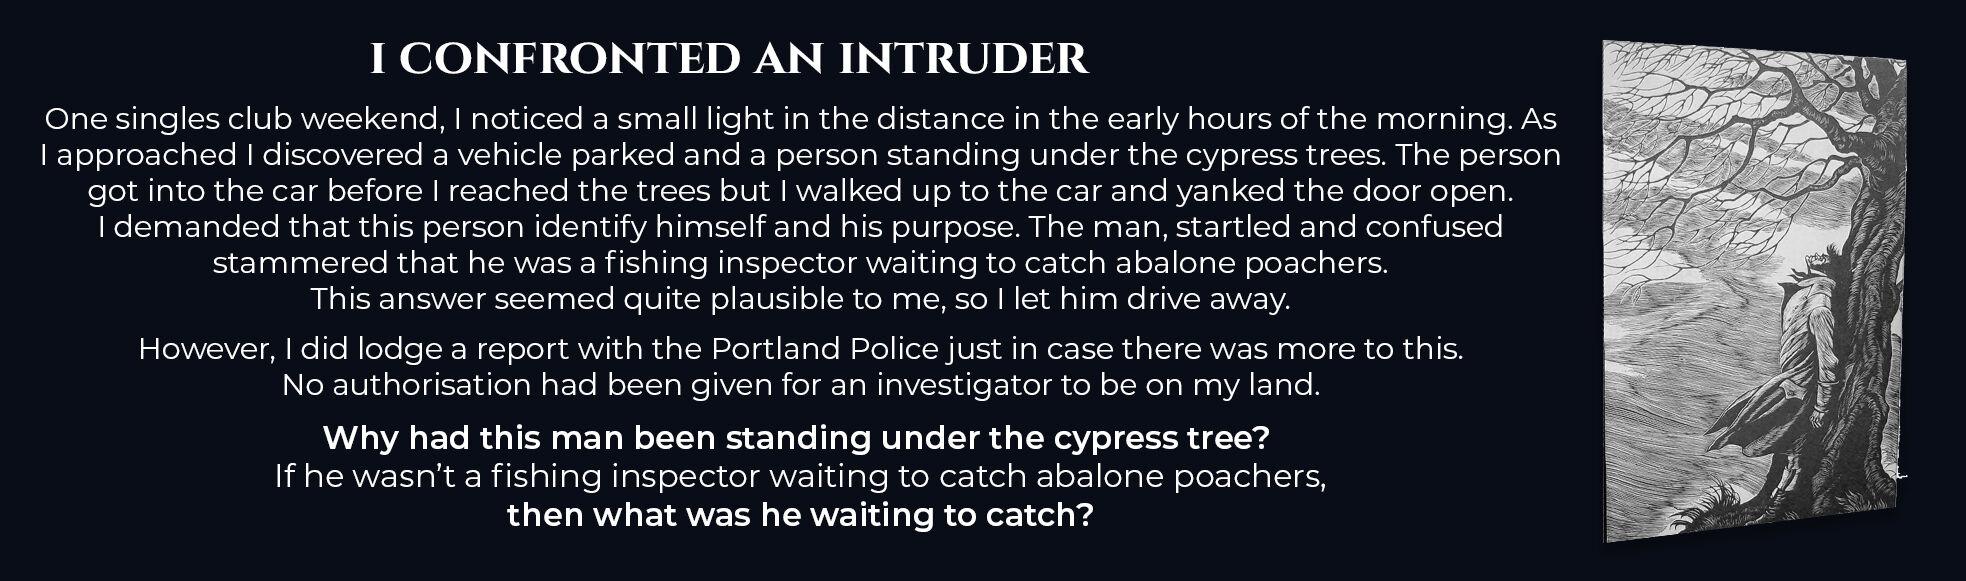 Absent Justice - Intruder